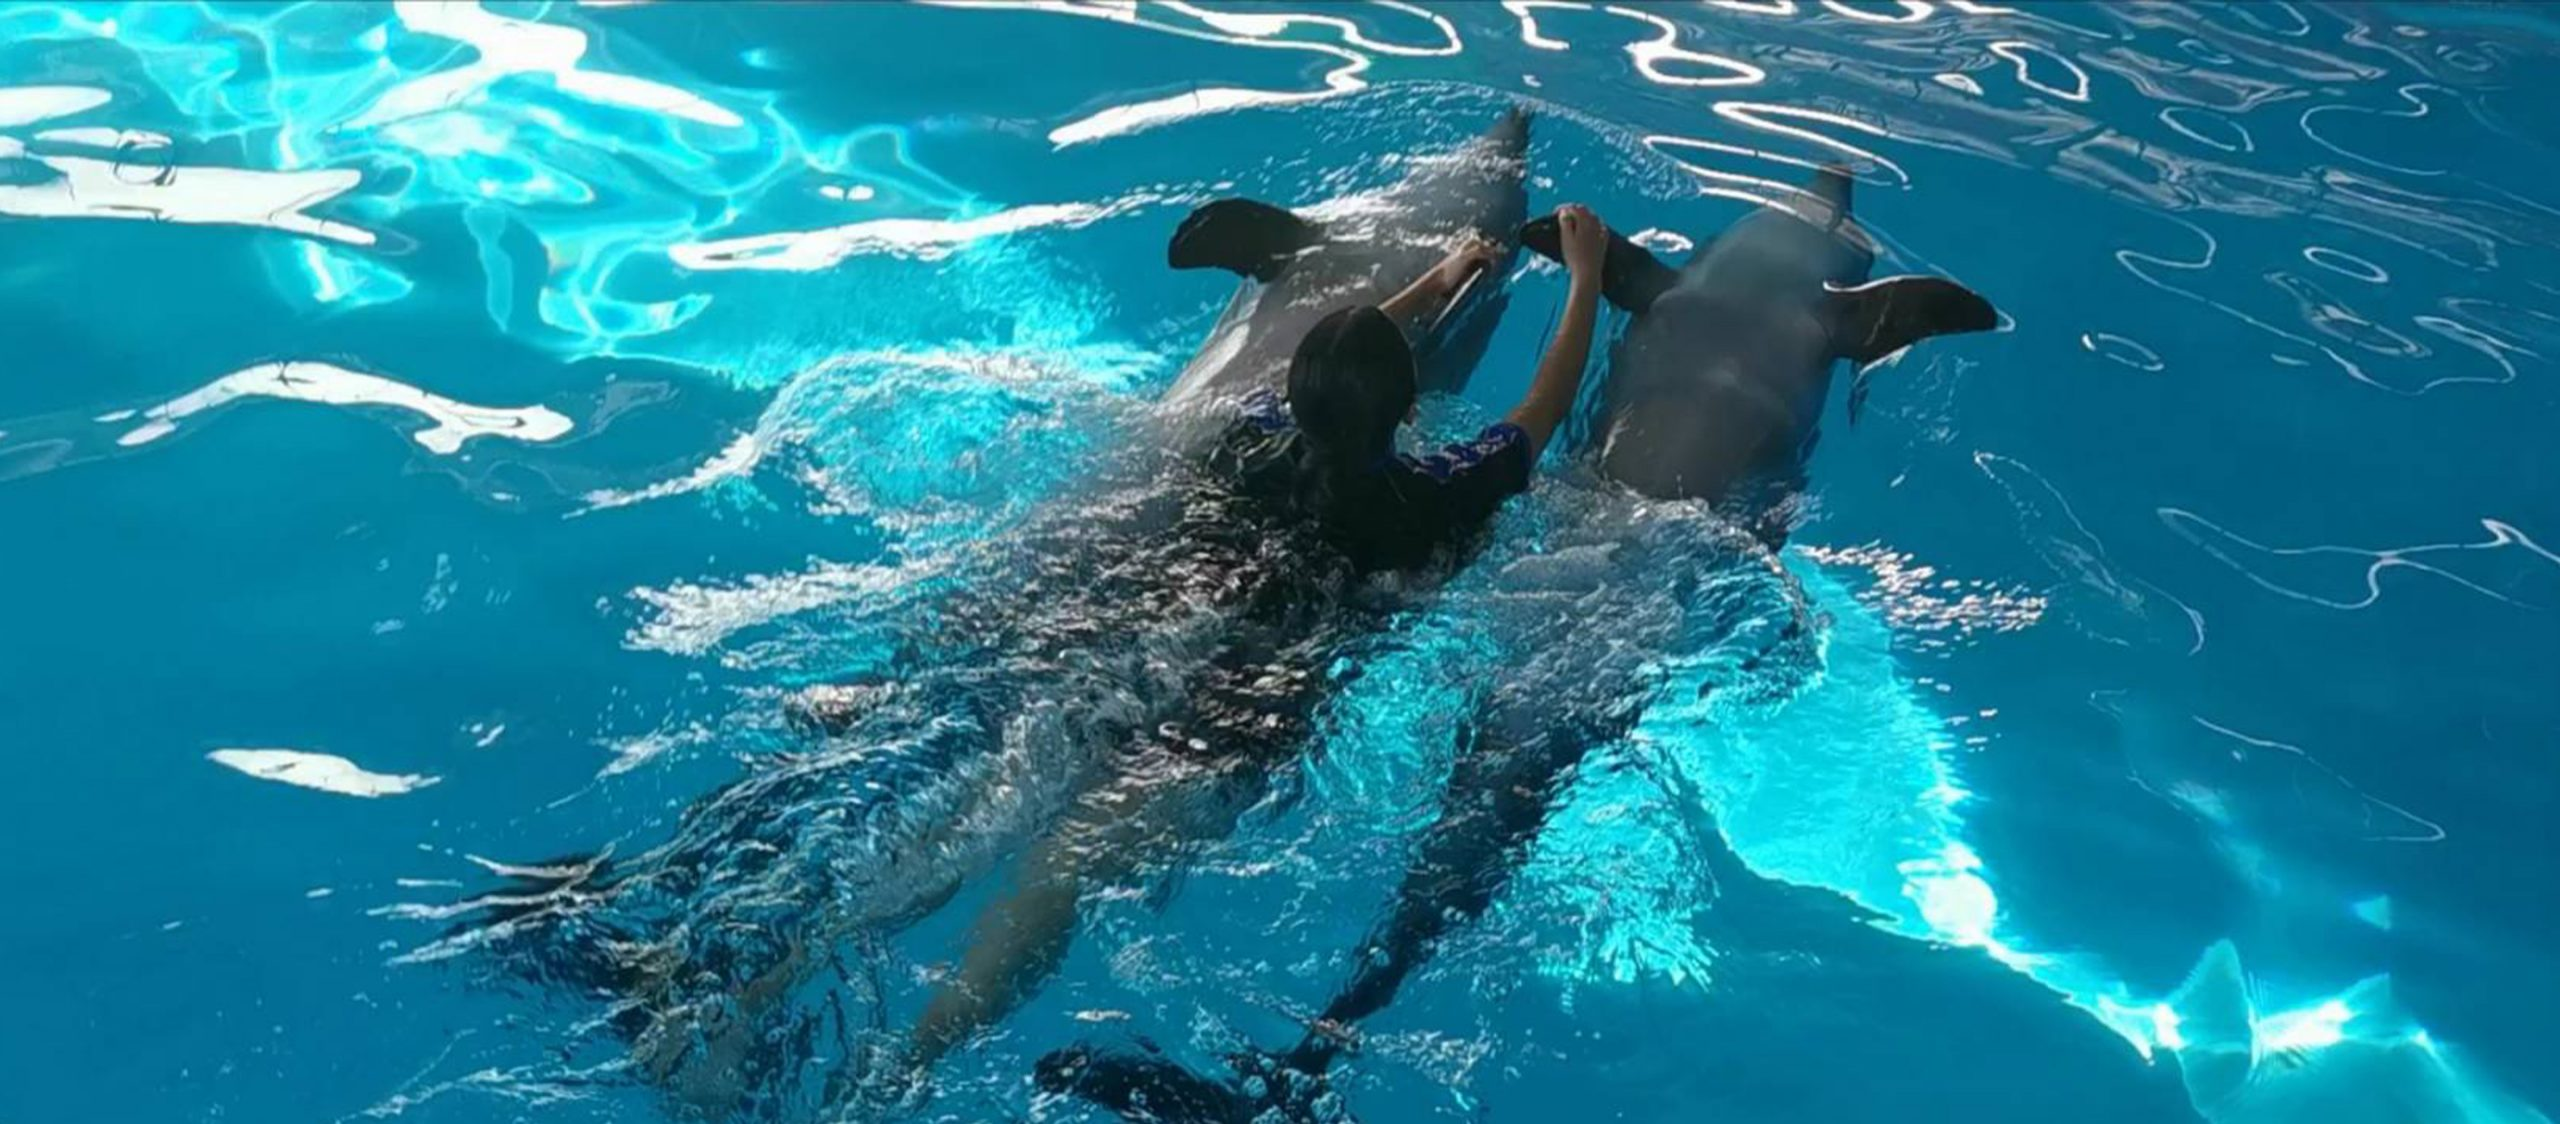 Dolphins and My Little Dream: ไปเล่นกับโลมาสิ ความฝันของเธอไม่ใช่เหรอ